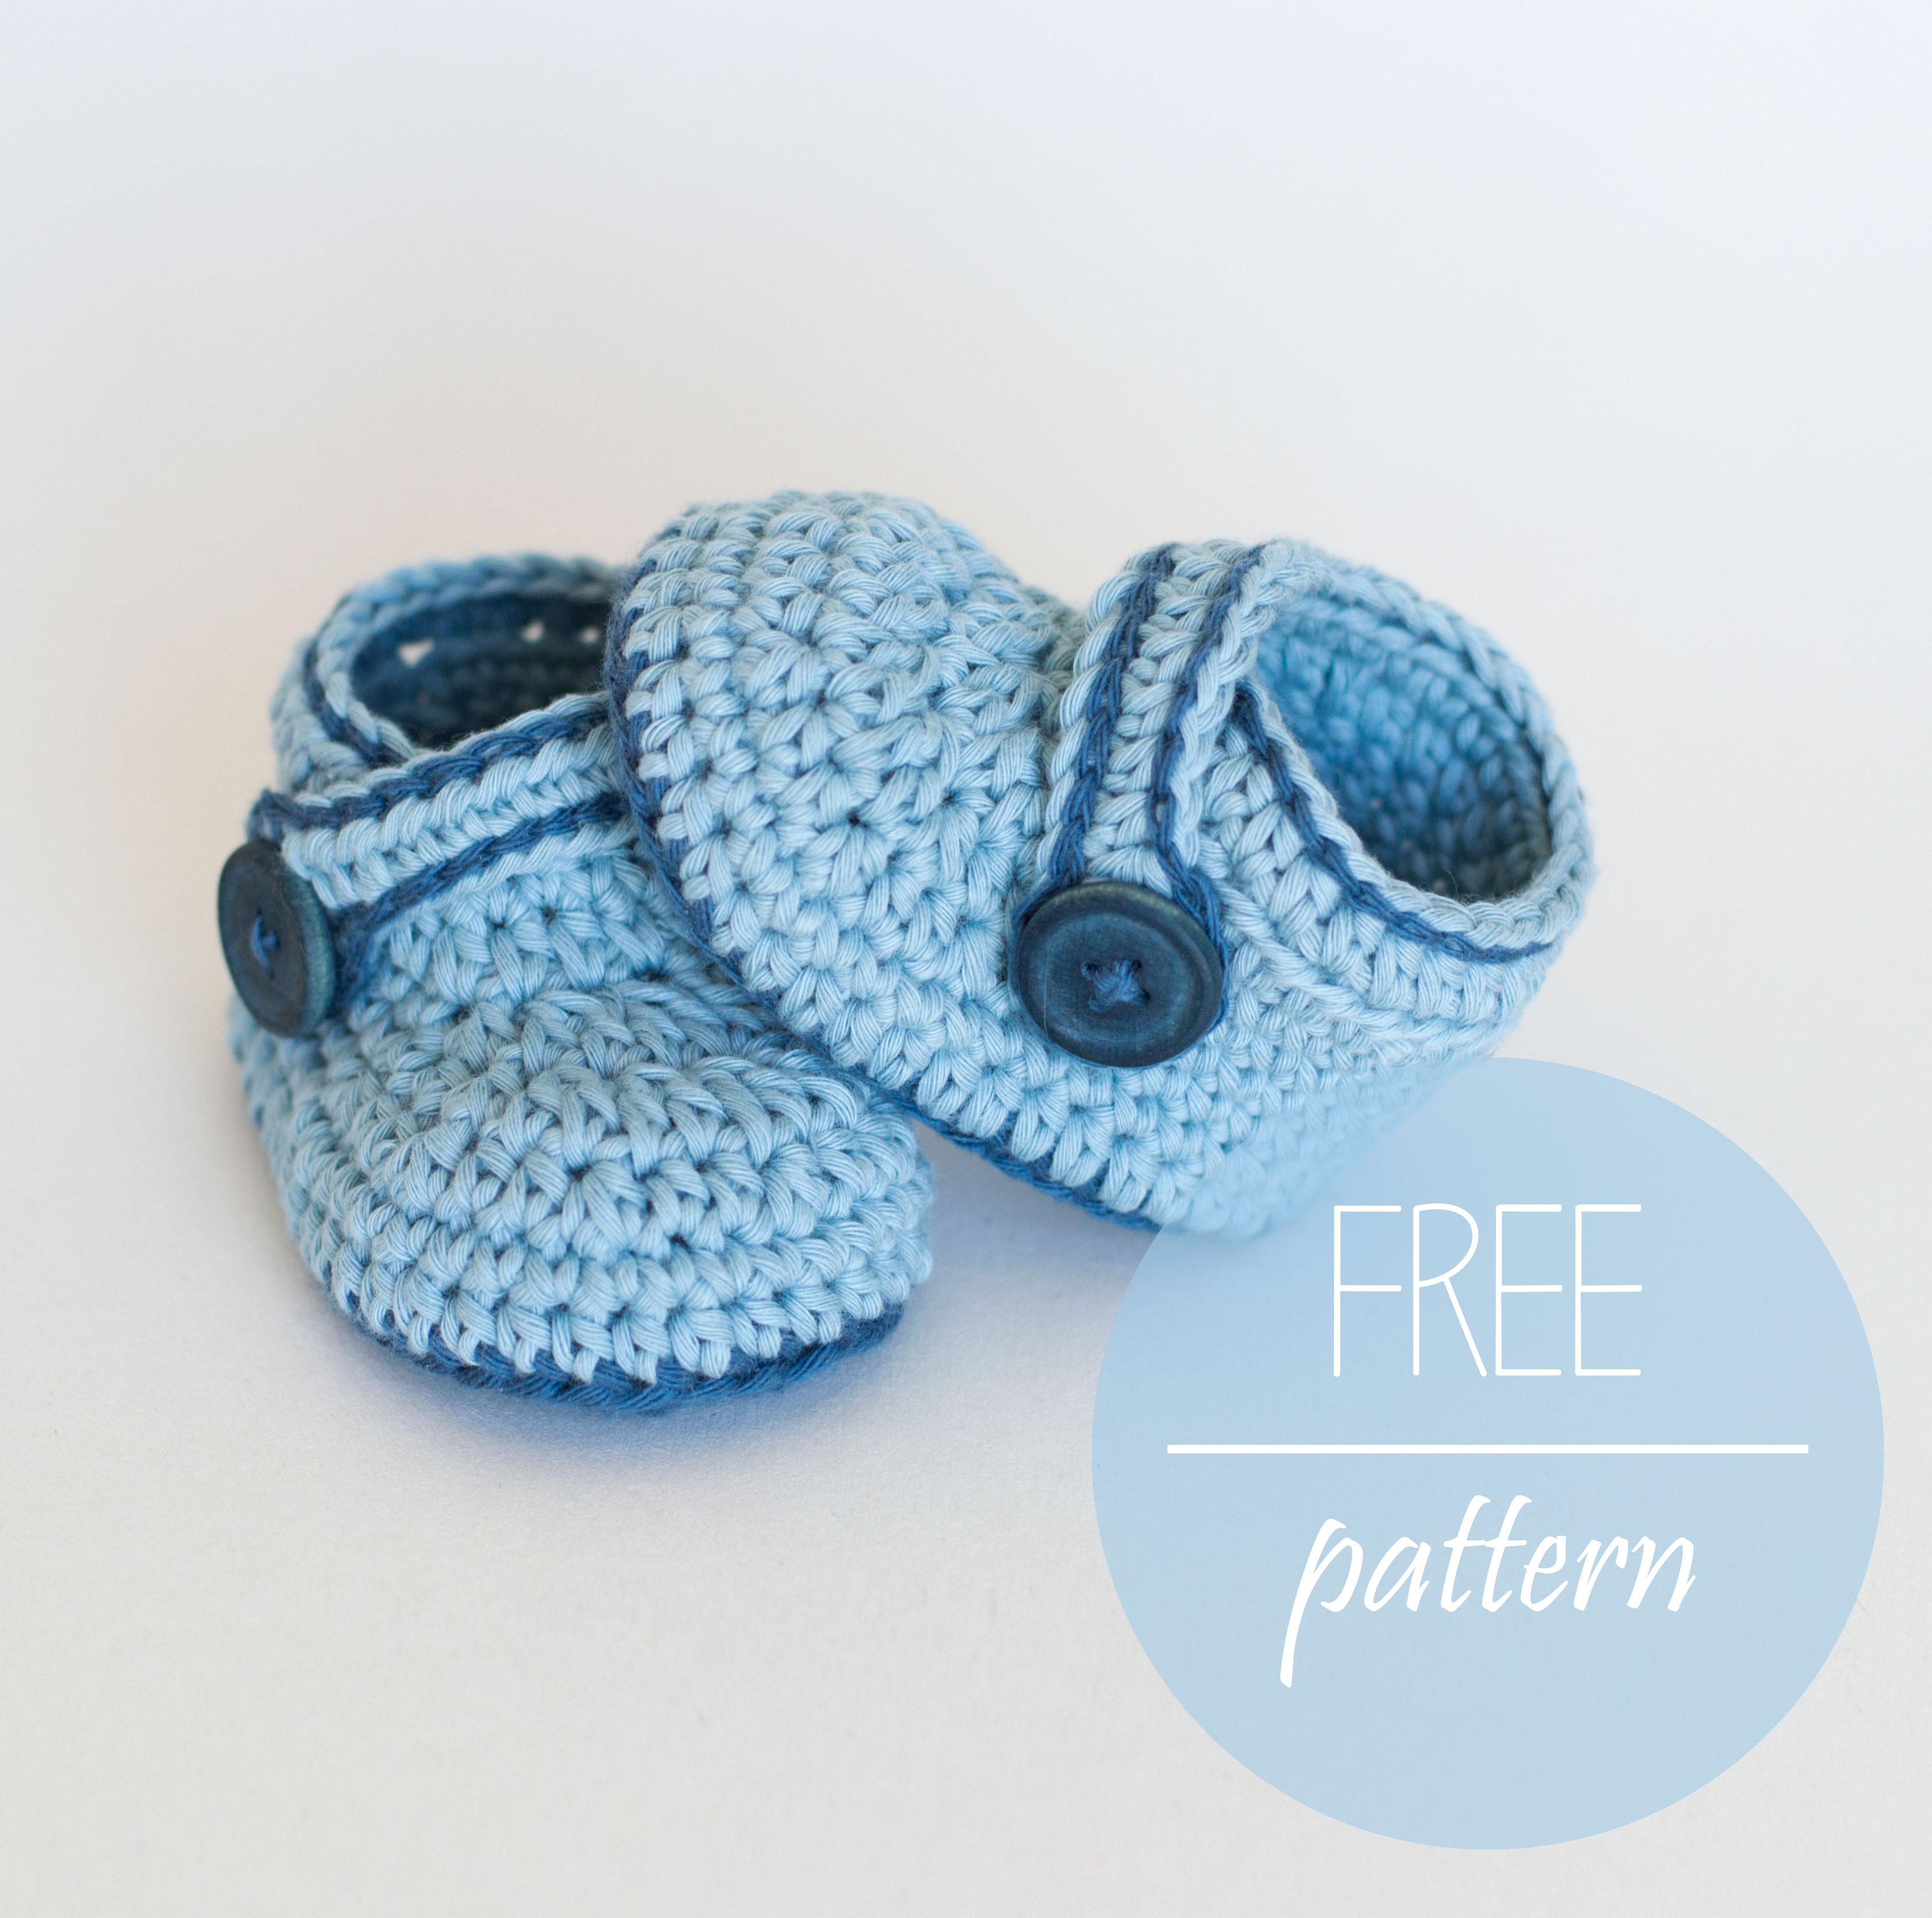 Crochet Patterns Free Free Crochet Pattern Blue Whale Cro Patterns